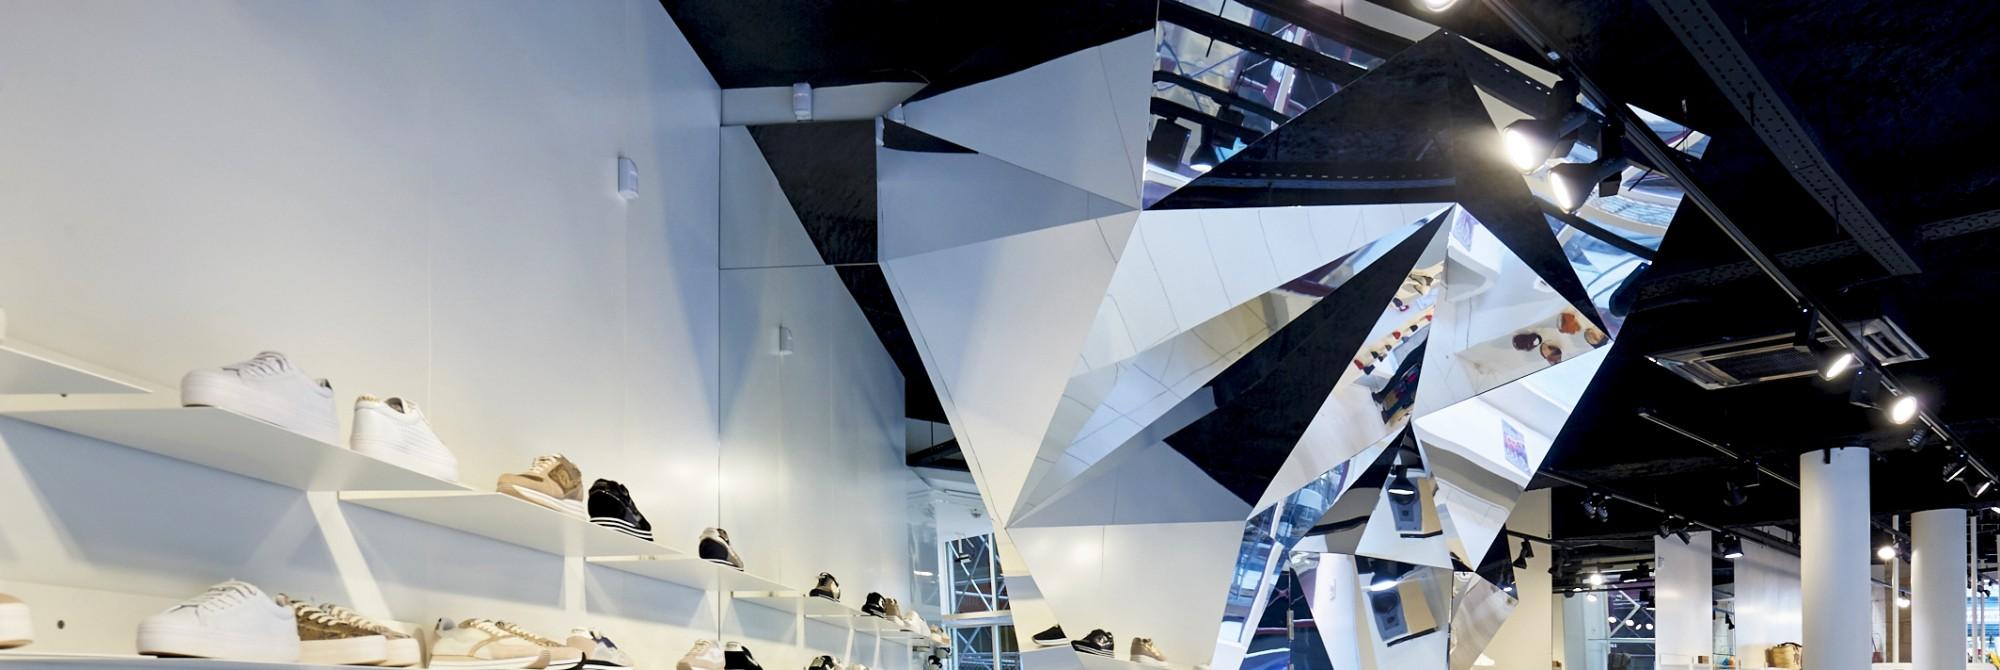 DIBOND® Spezialitäten - ©3A Composites | Architekt: S+M Architectes | Fotograf: Philippe Caumens